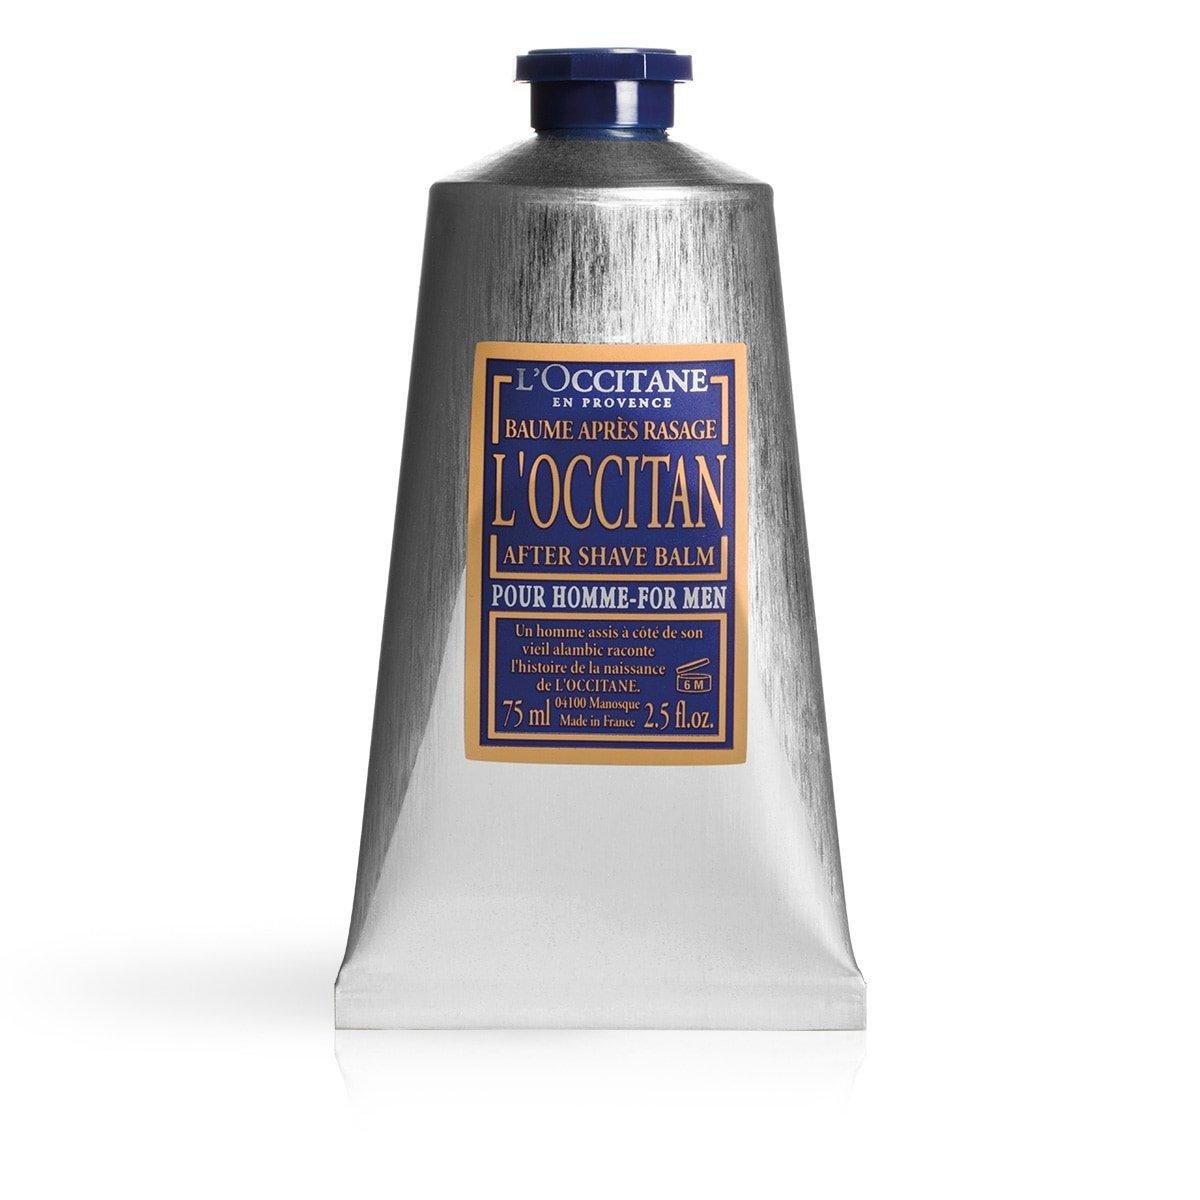 L'Occitane Moisturizing L'Occitan After Shave Balm for Men with Shea Butter, 2.5 fl. oz.